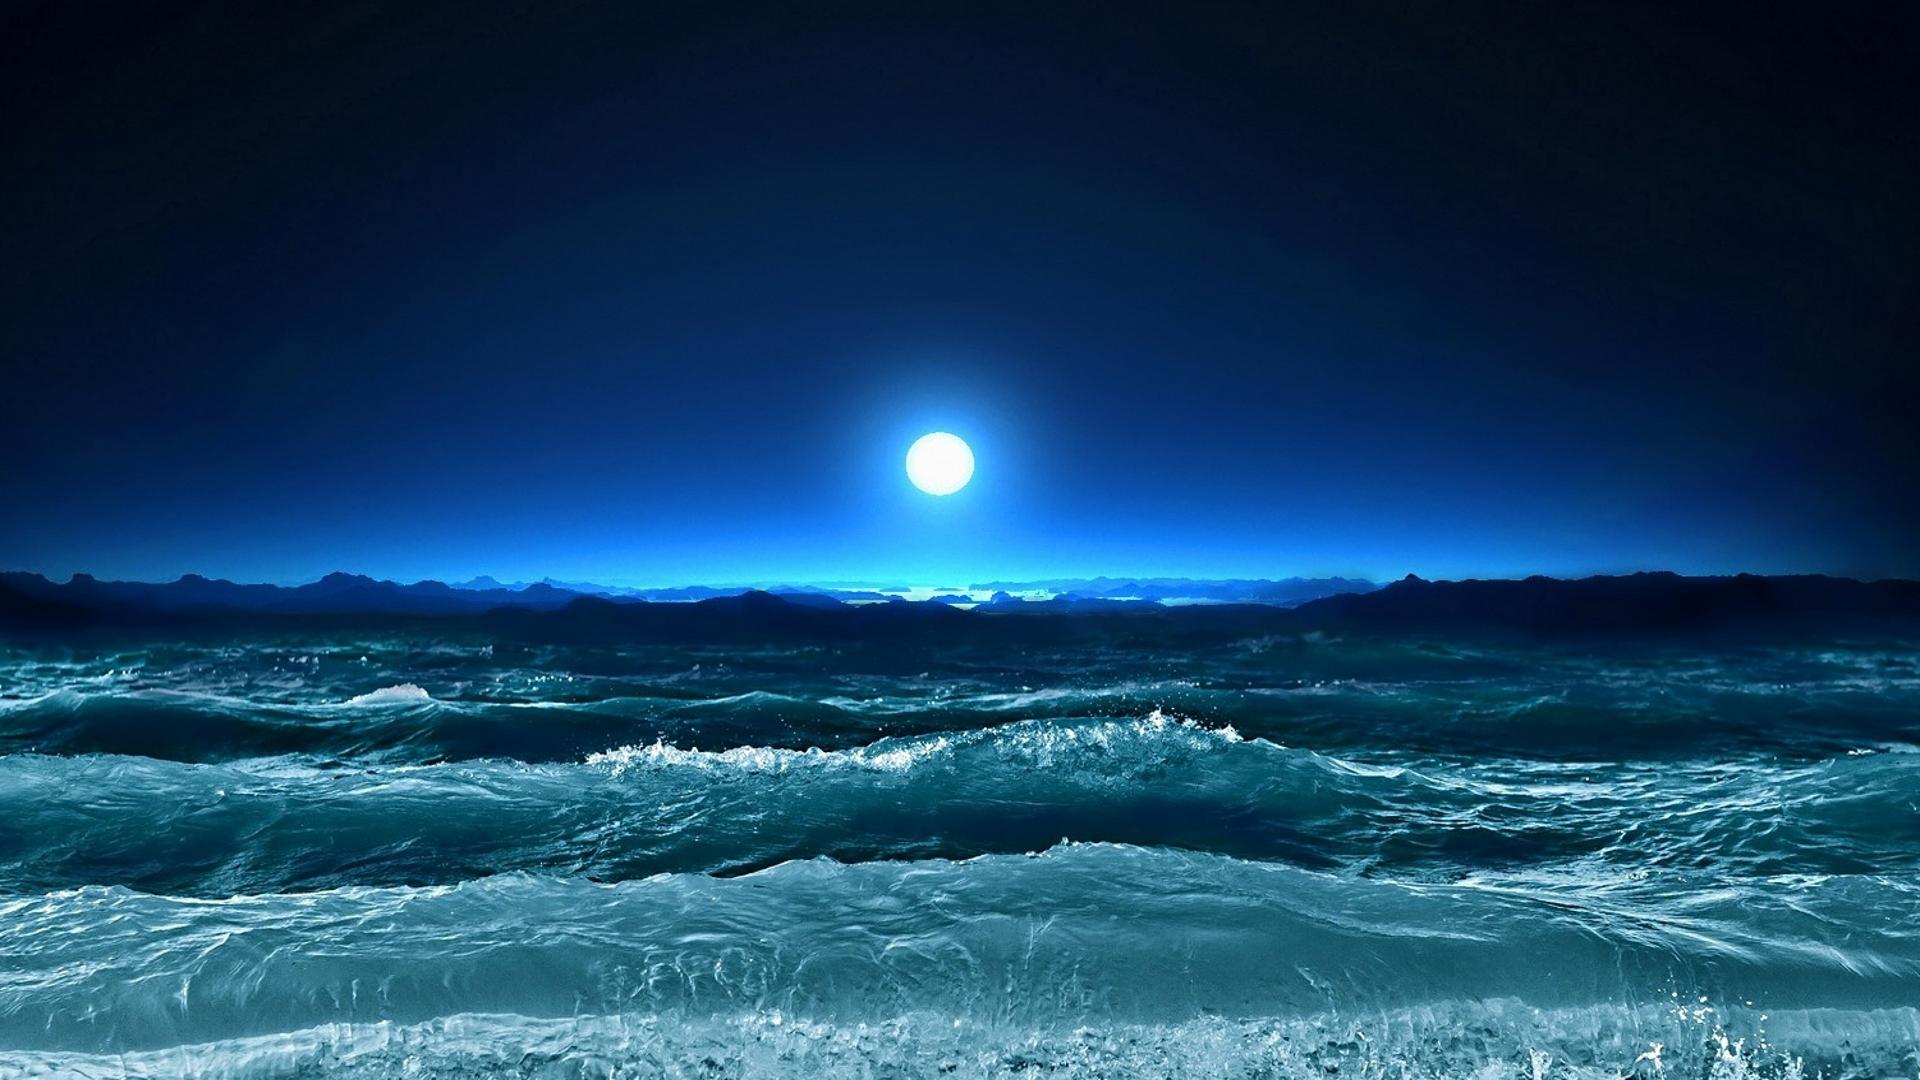 fileswordpresscom200912silent ocean waves 219841jpg 1920x1080